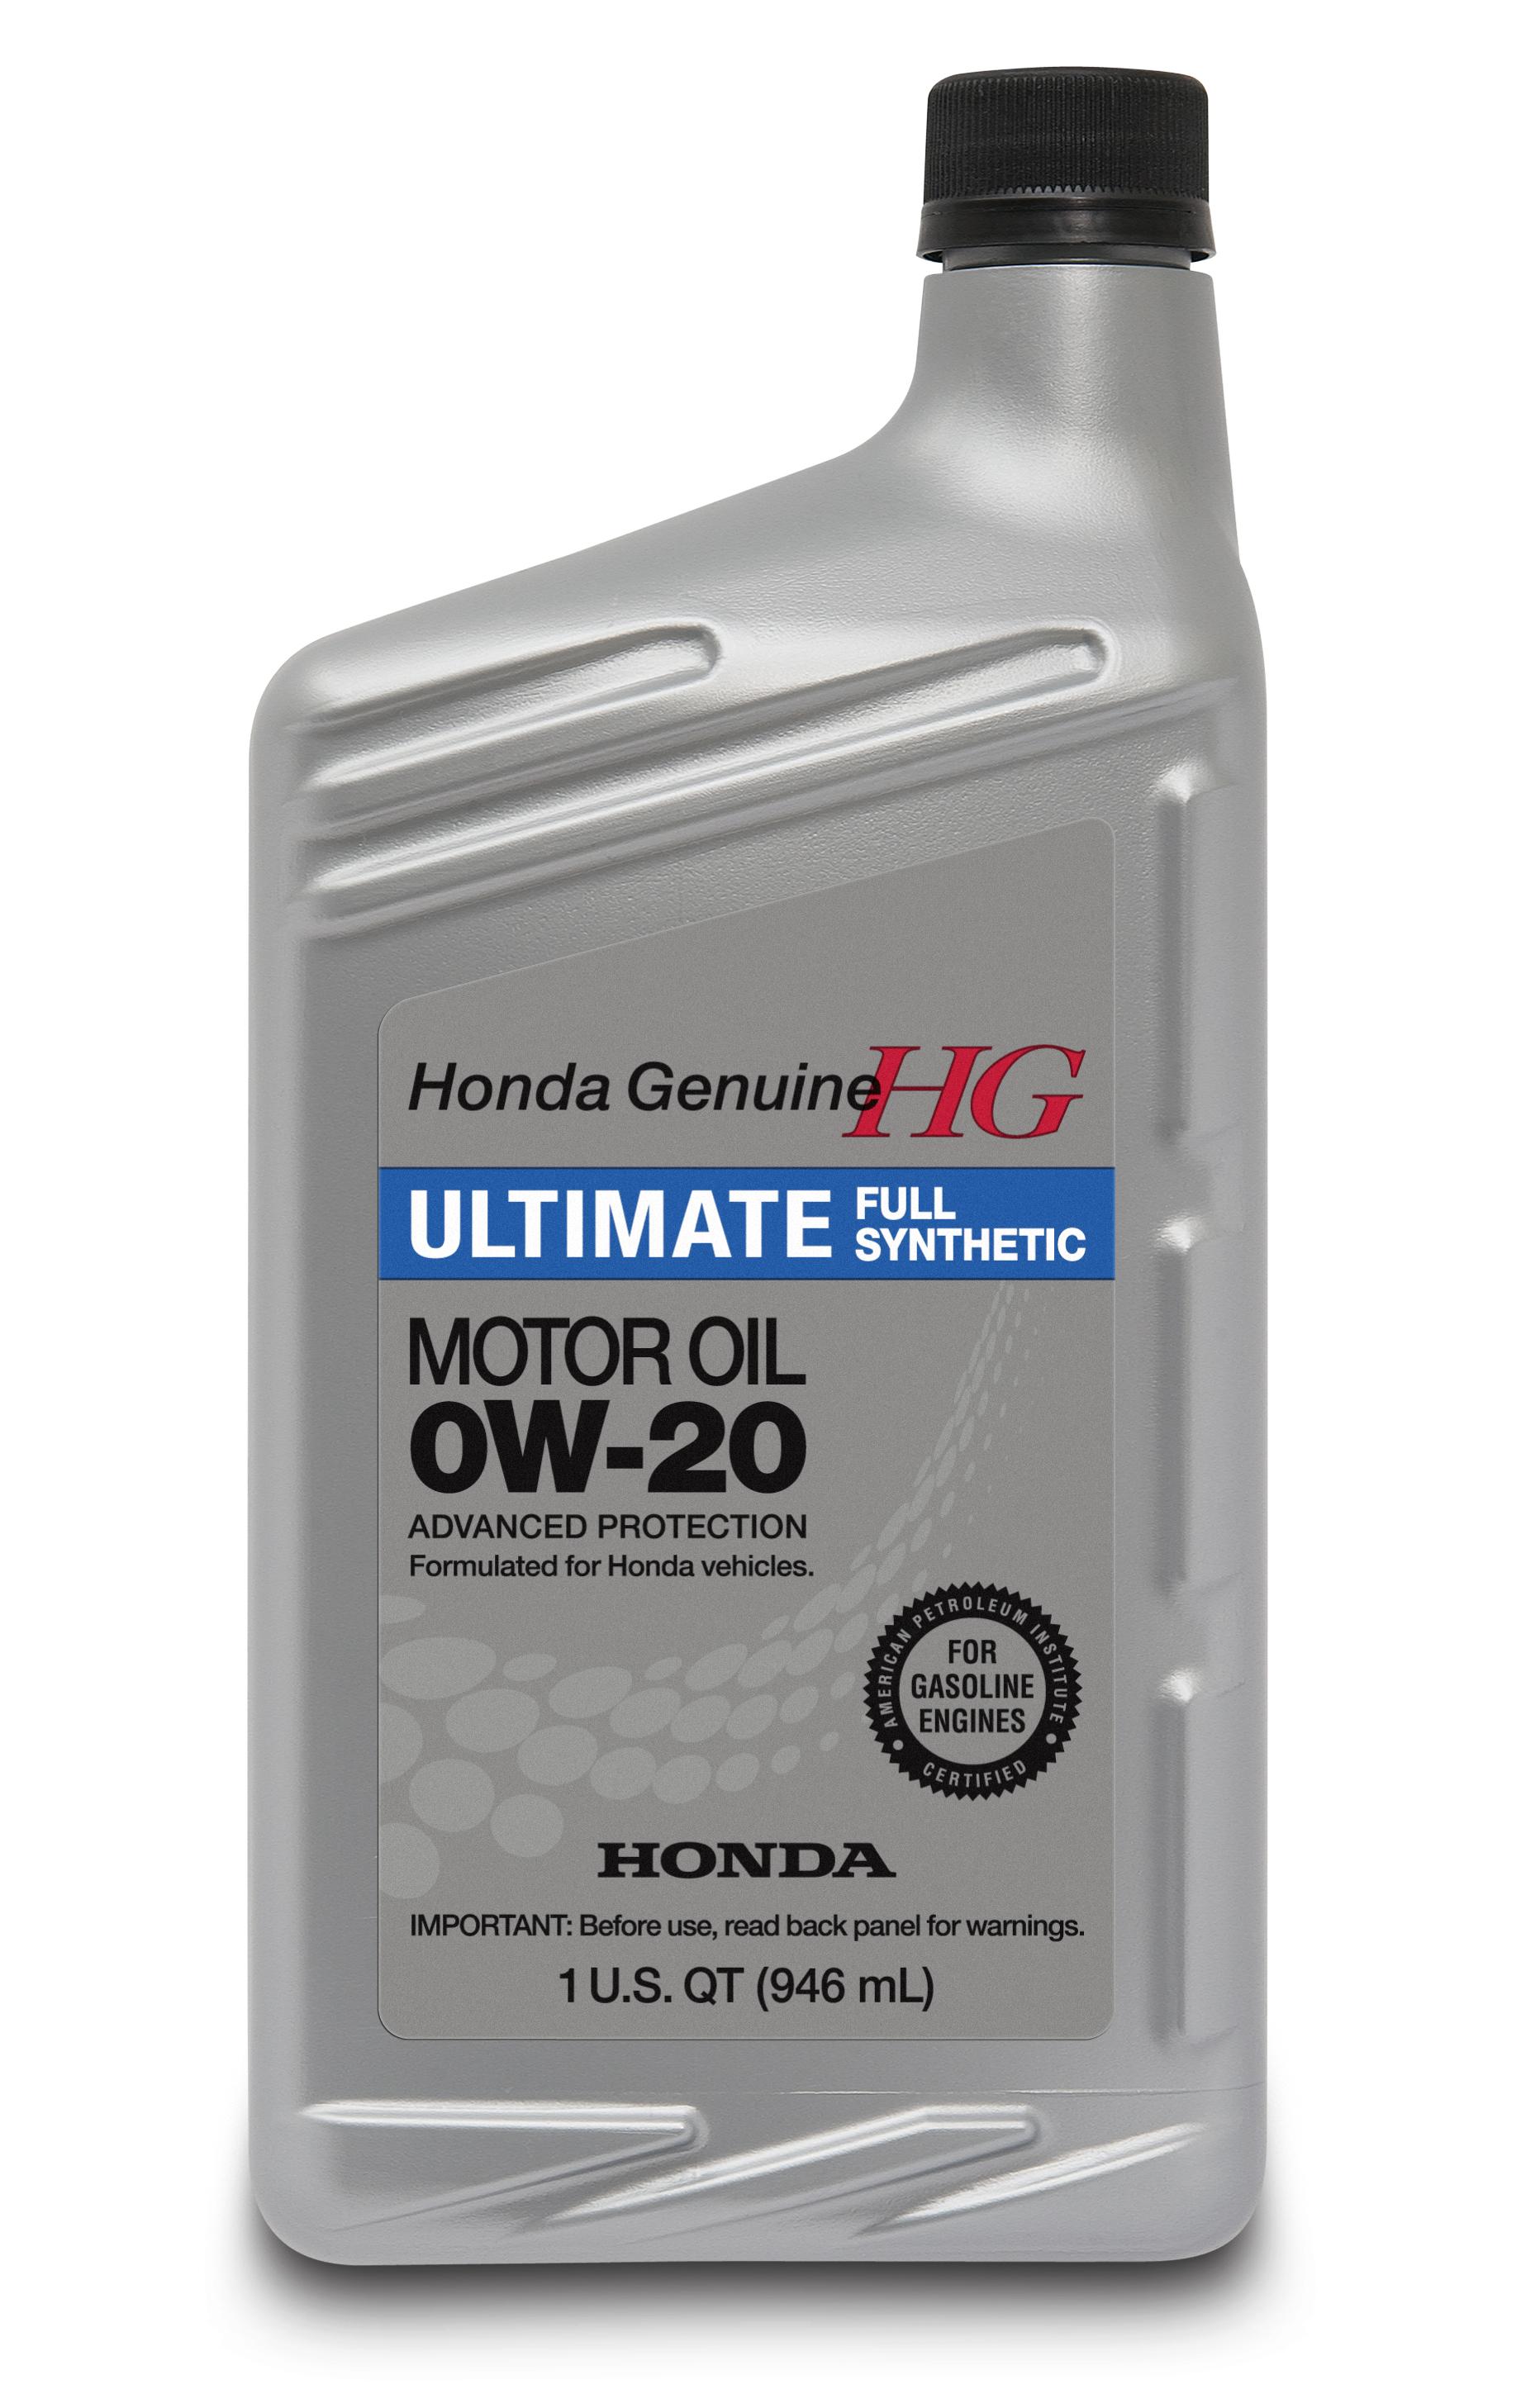 Oil, Ult Synth(0W20) - Honda (08798-9037)